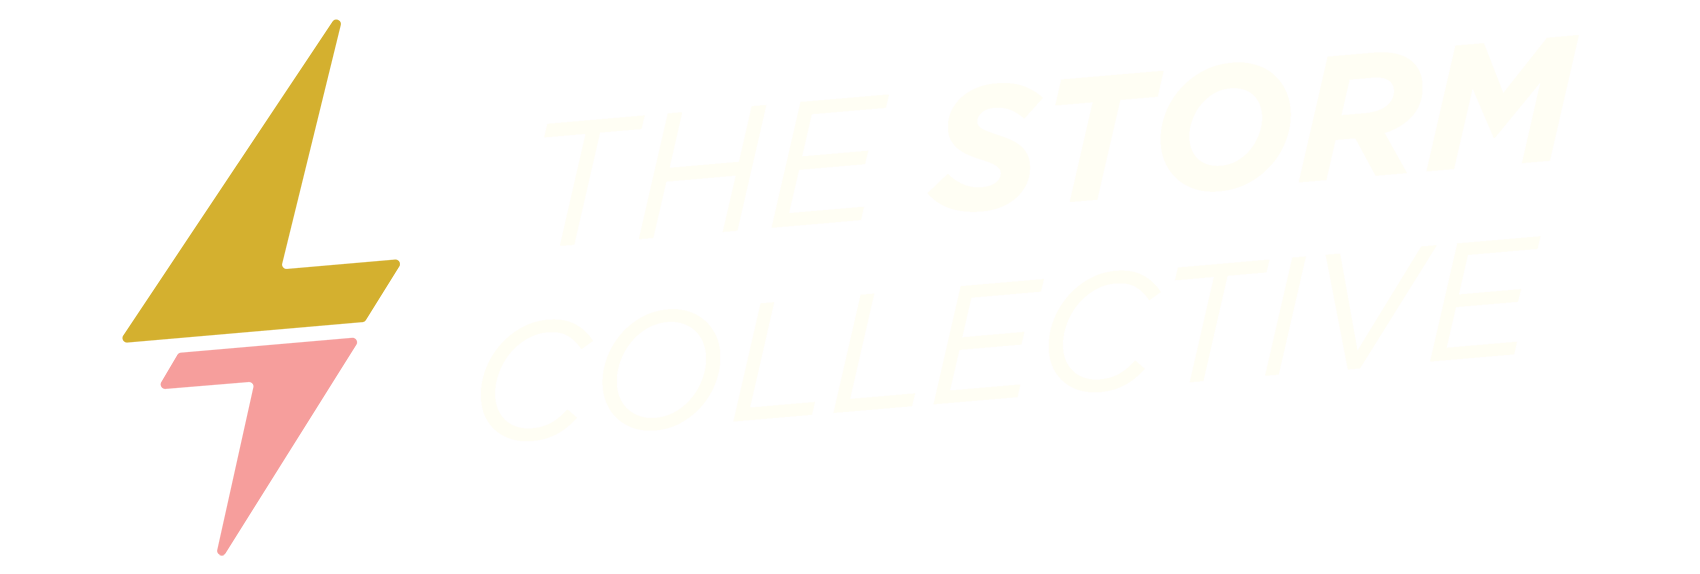 StormLogo_white-Sized.png